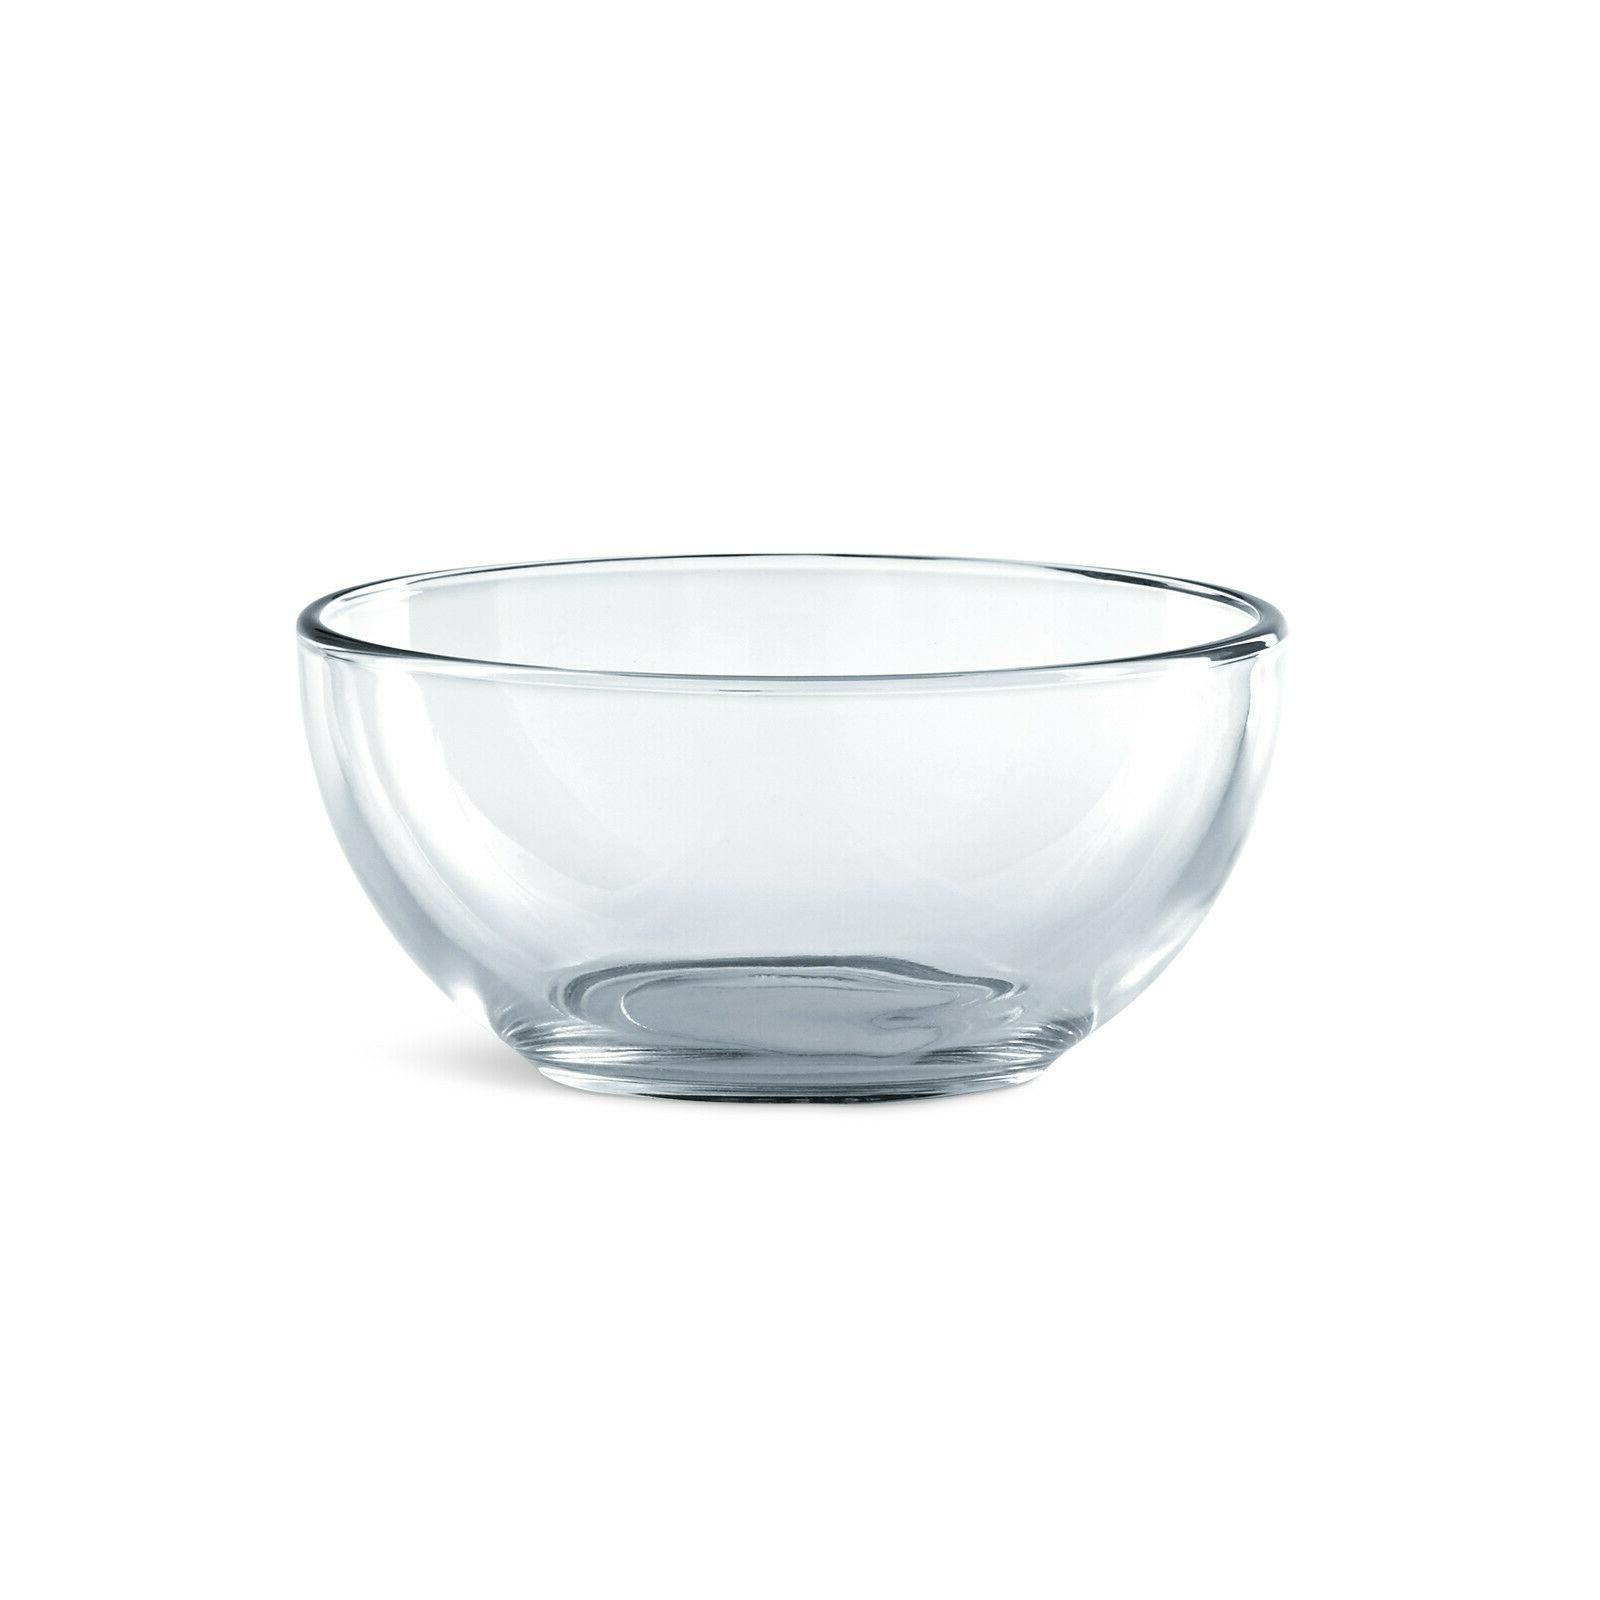 Dinnerware Set Glass Dinner Bowls Dishes